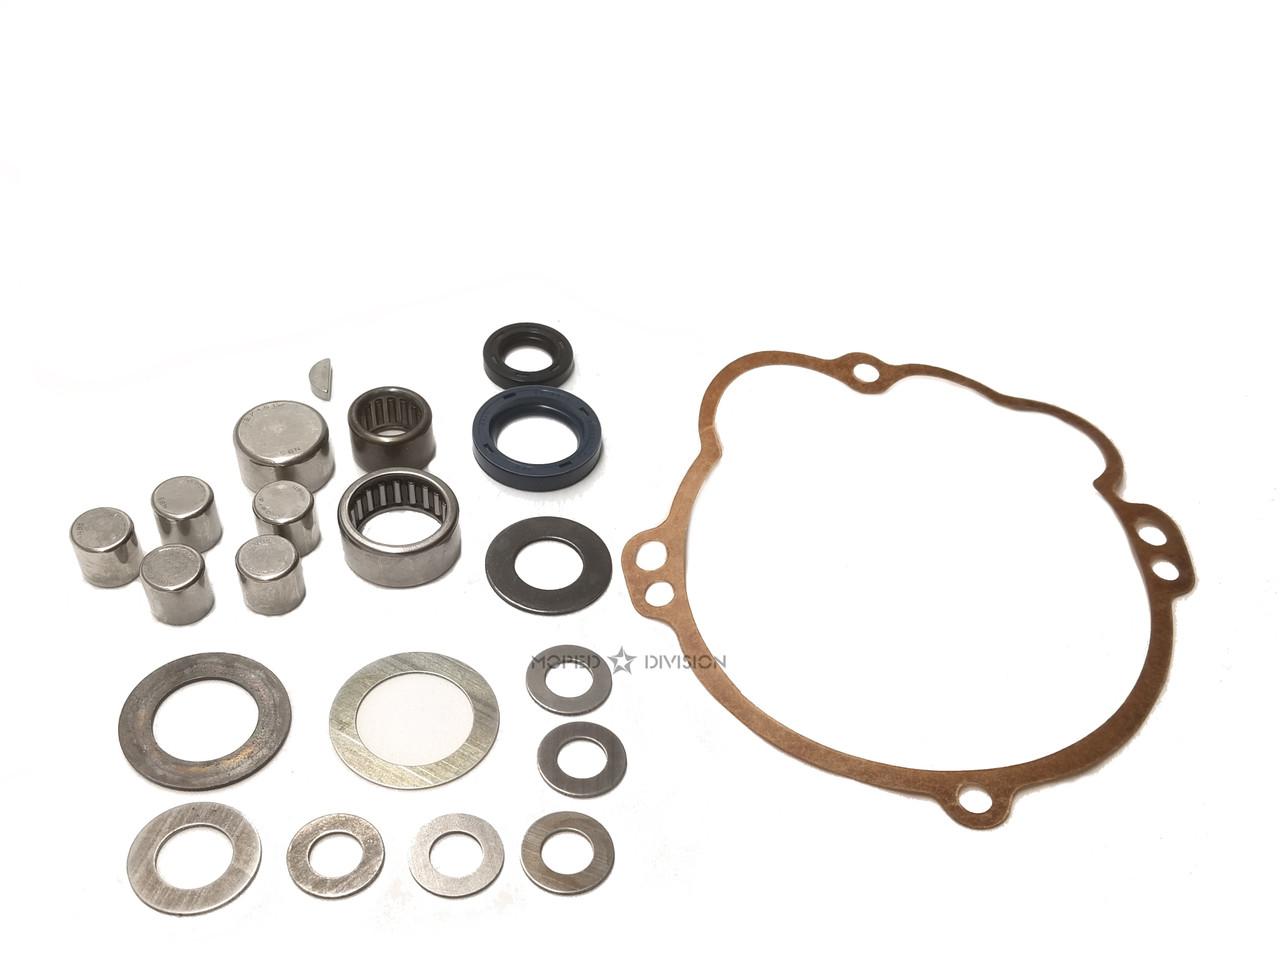 Vespa Piaggio Variated Gearbox / Transmission Rebuild- Complete Kit